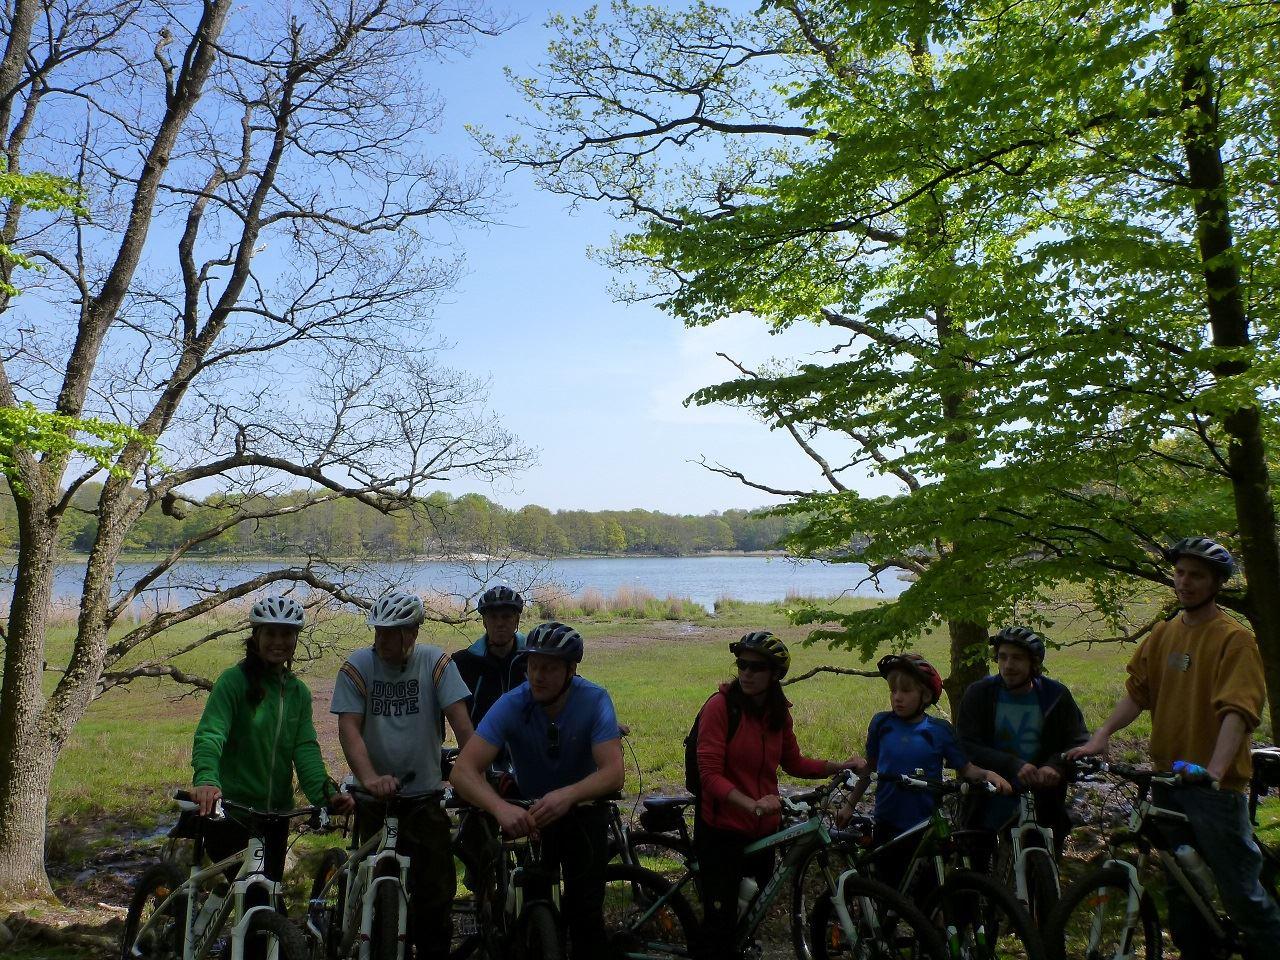 Cykelsafari bland vilda djur